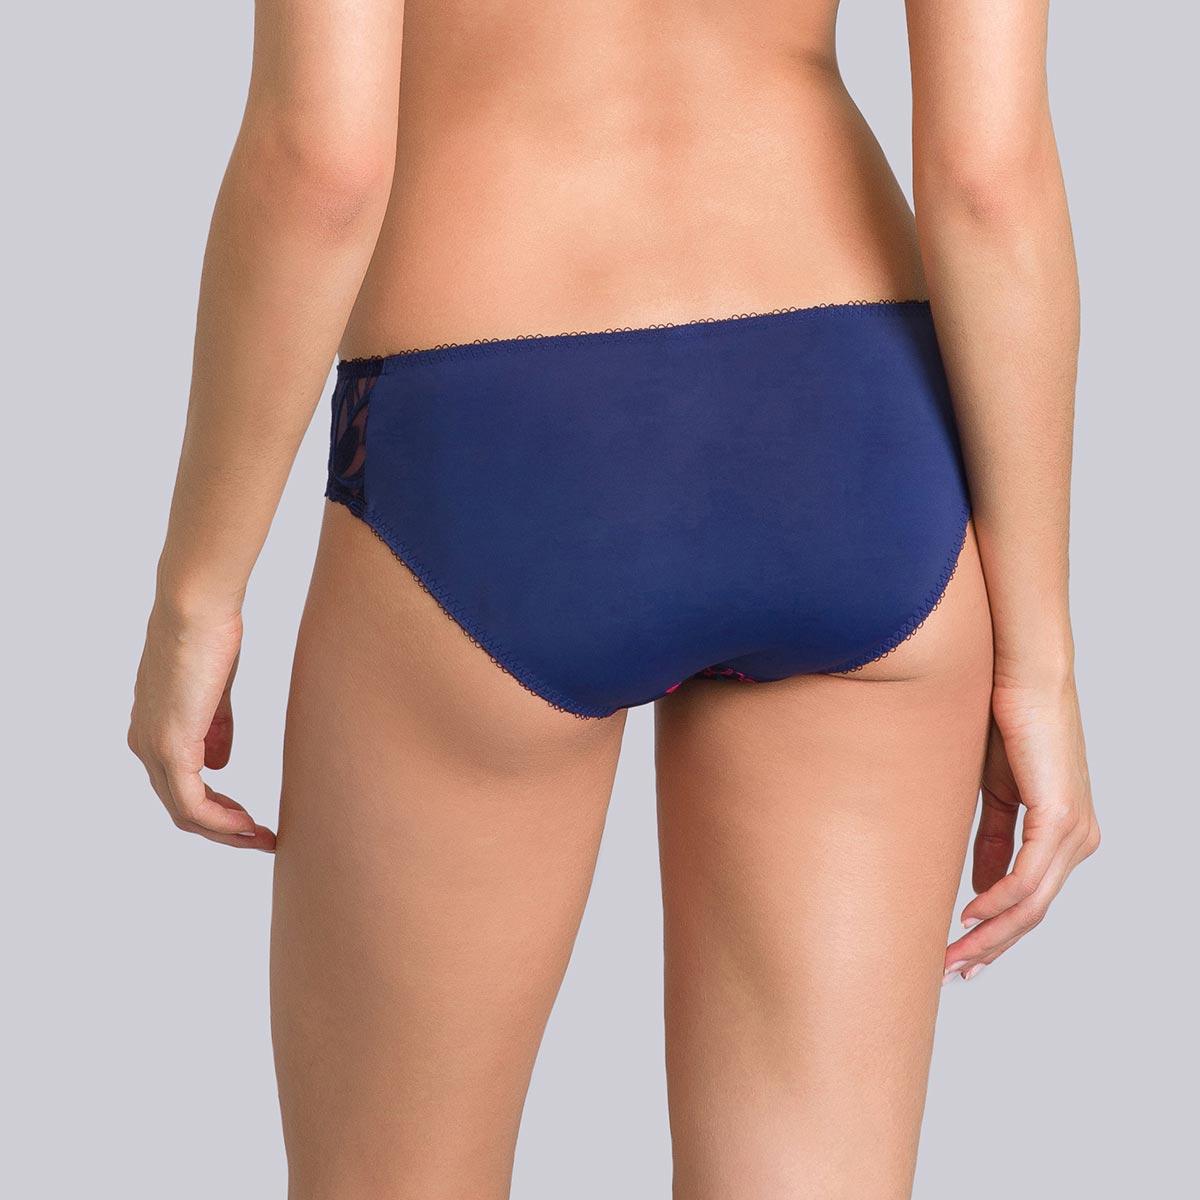 Blue mini briefs with coral print - Daily Elegance-PLAYTEX